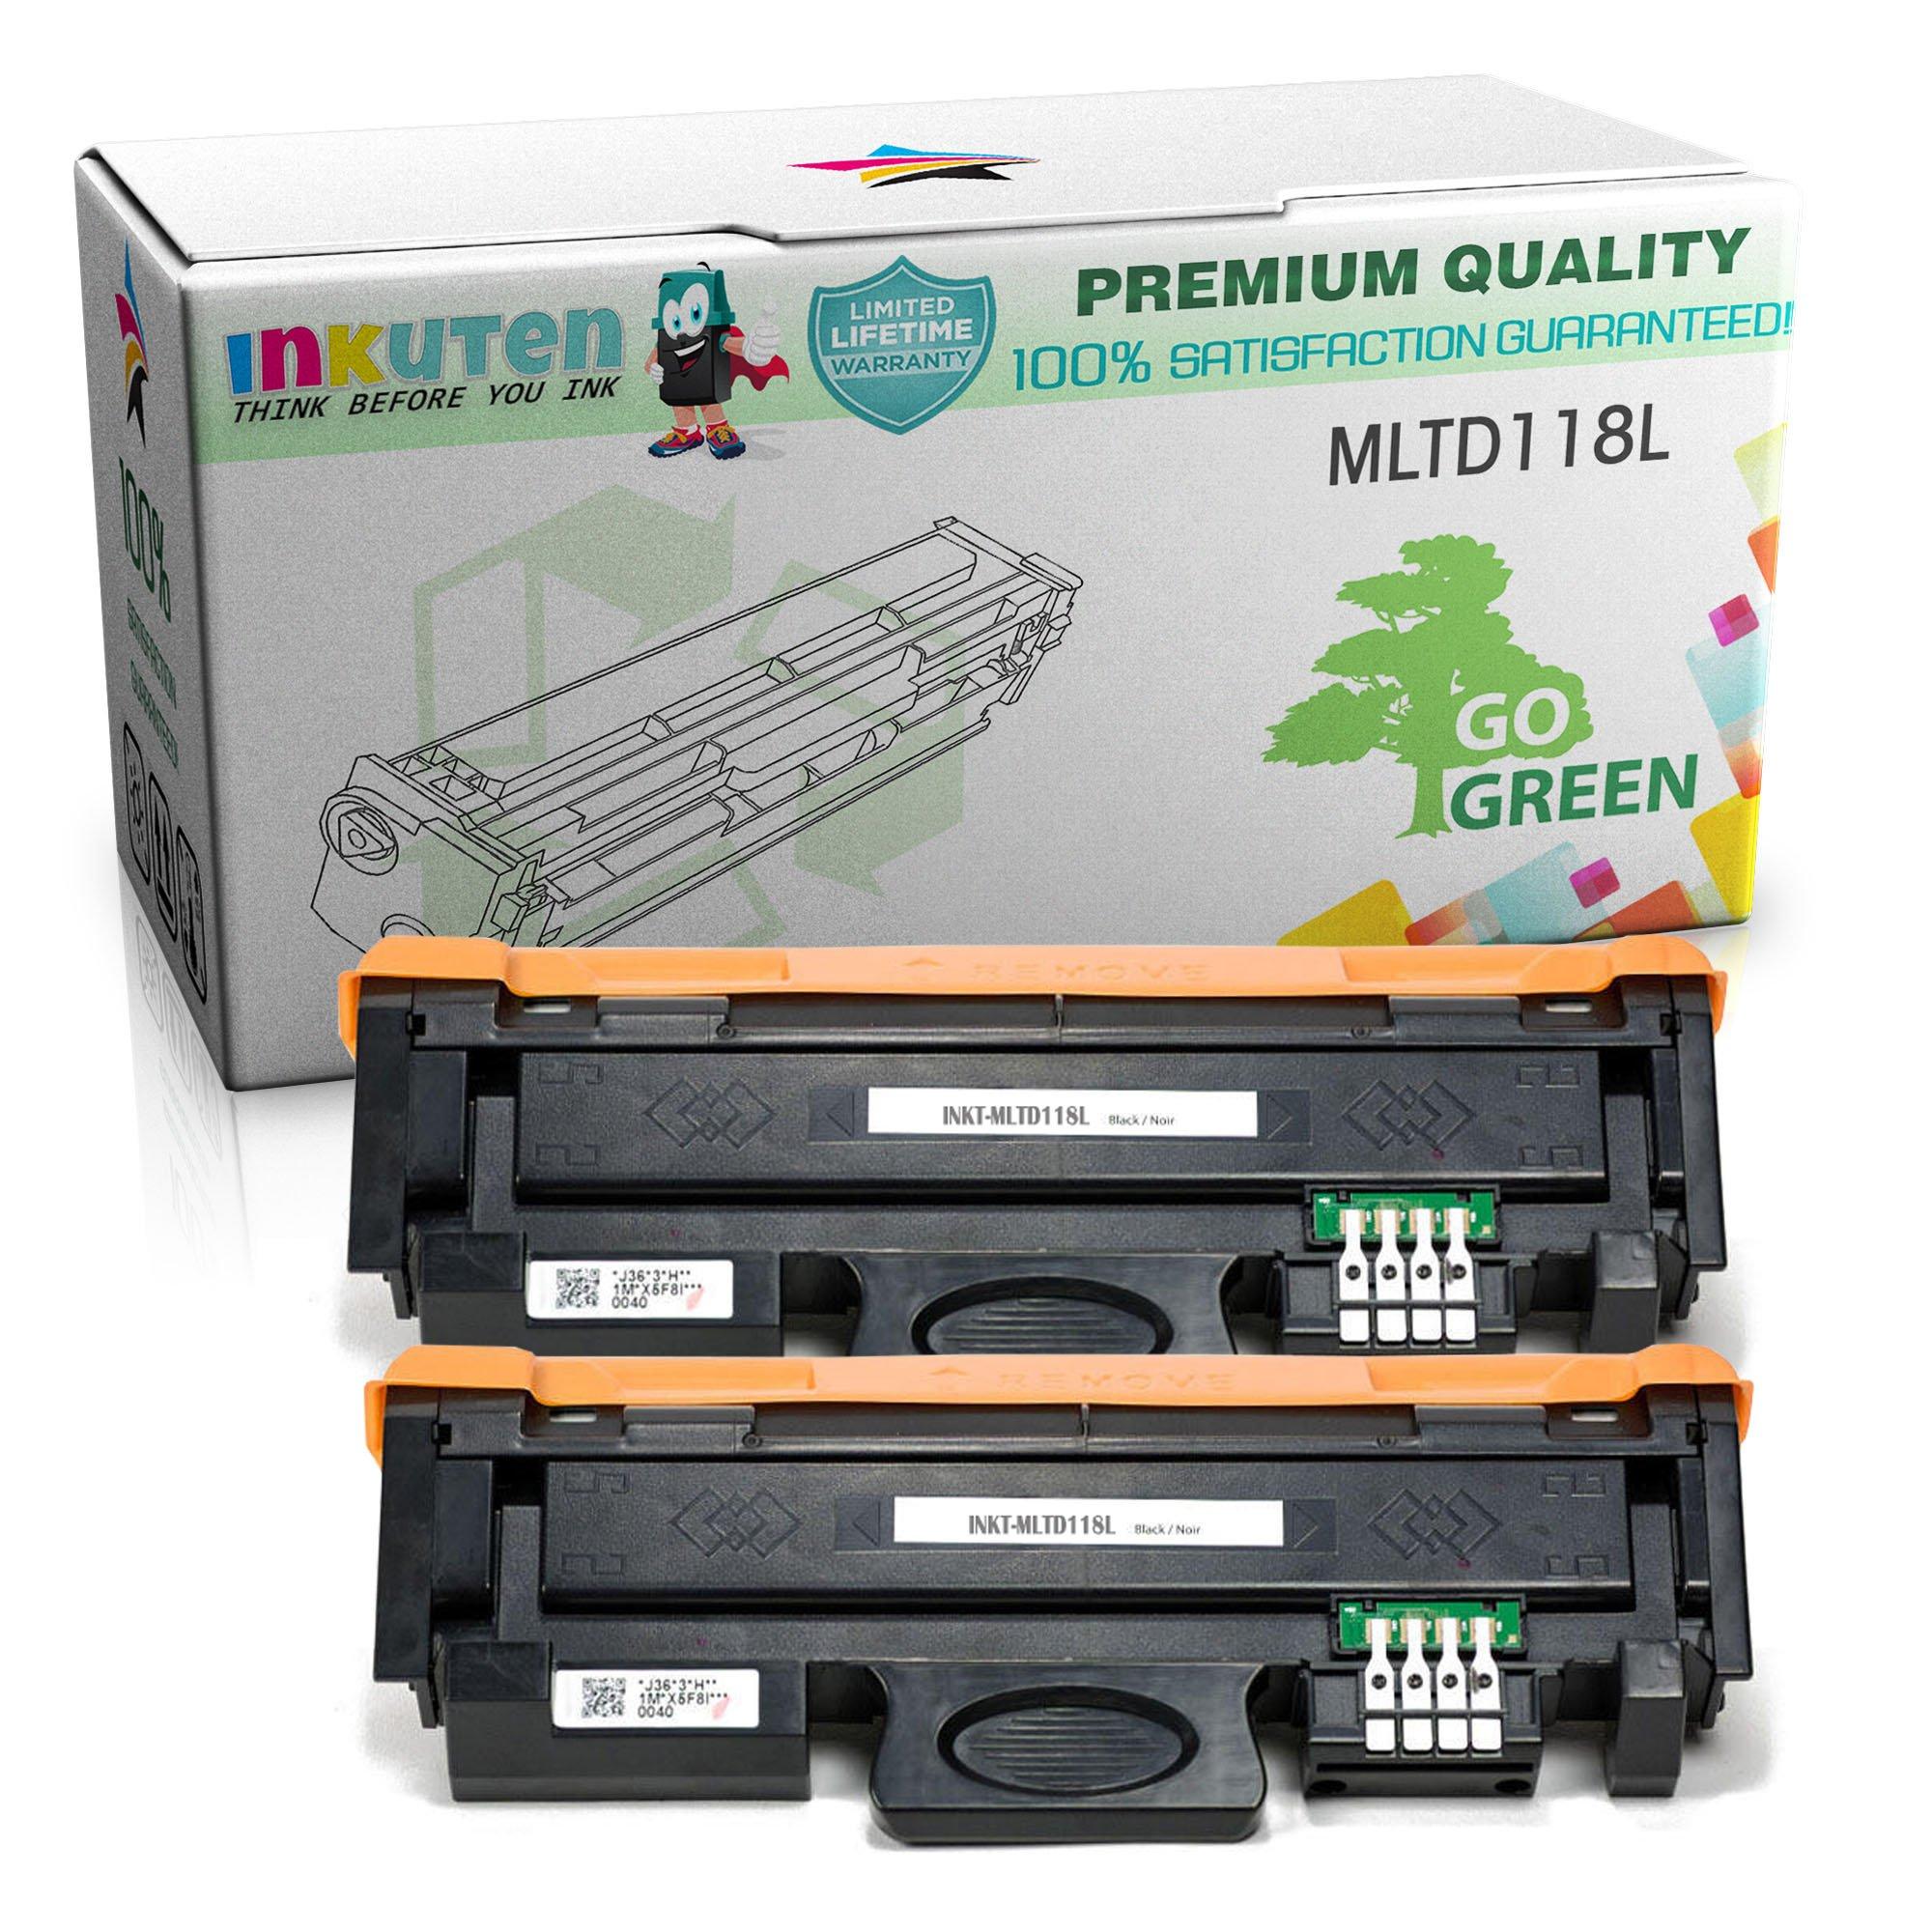 INKUTEN 2 Pack Compatible Samsung MLT-D118L Black Laser Toner Cartridge for Samsung Xpress M3015DW M3065FW Printers by INKUTEN (Image #1)